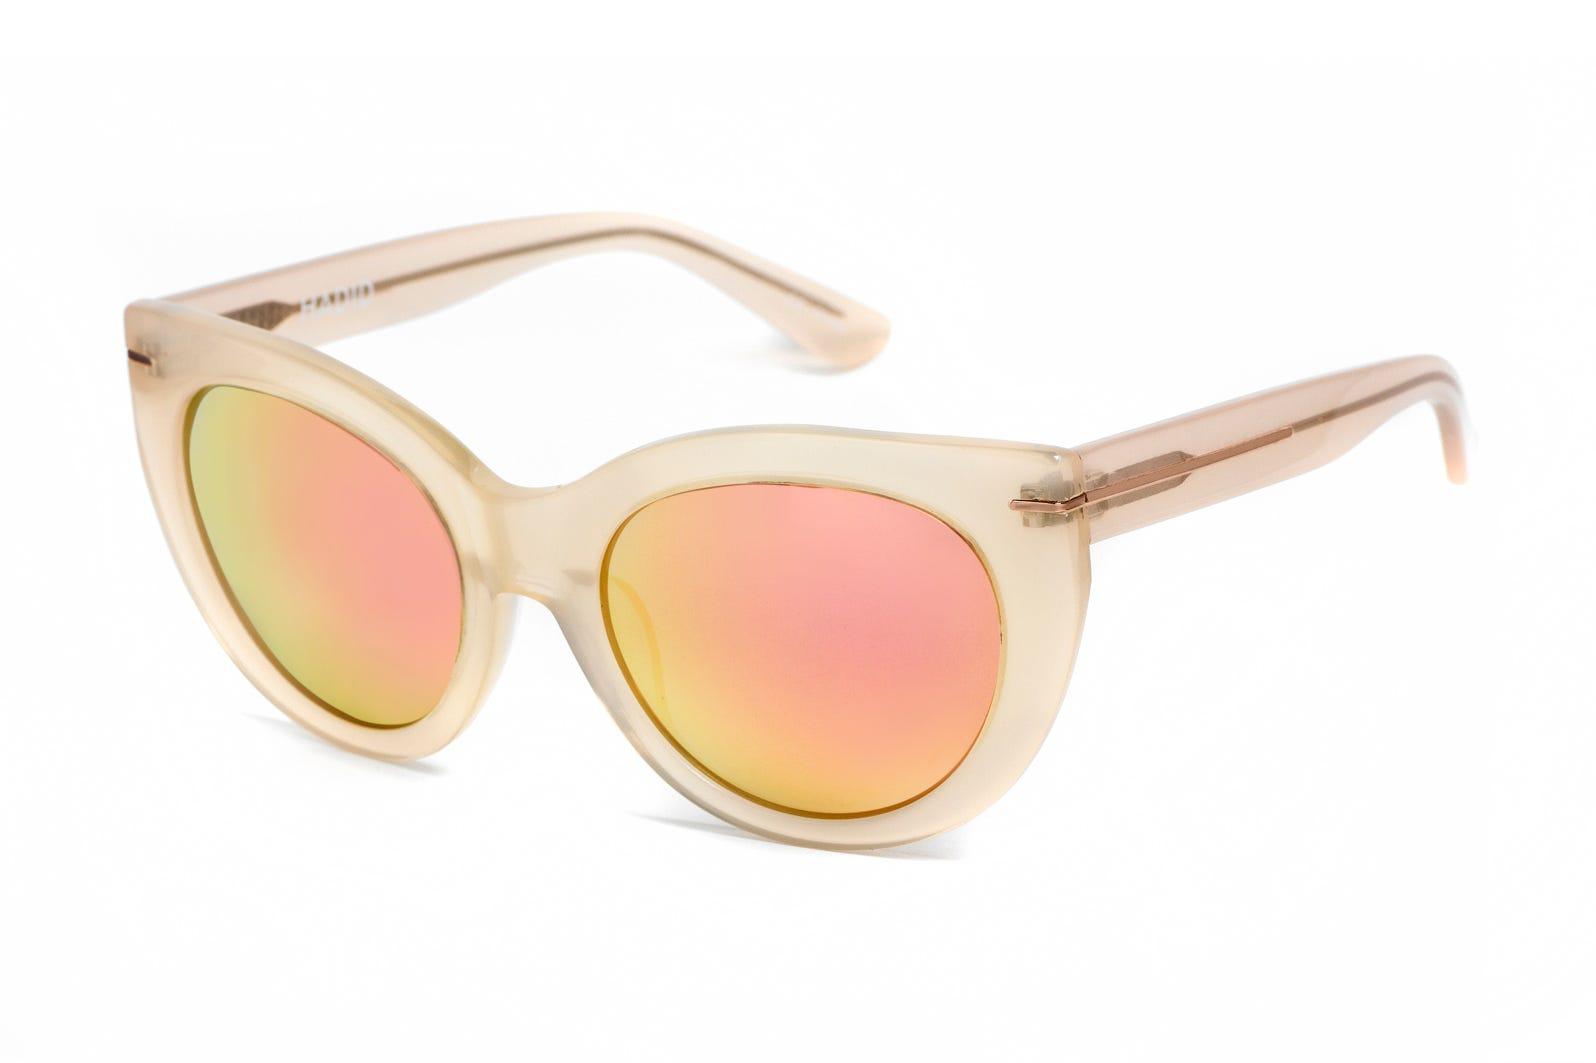 95a166fe63 Gigi Sunglasses Collection Price - Bitterroot Public Library